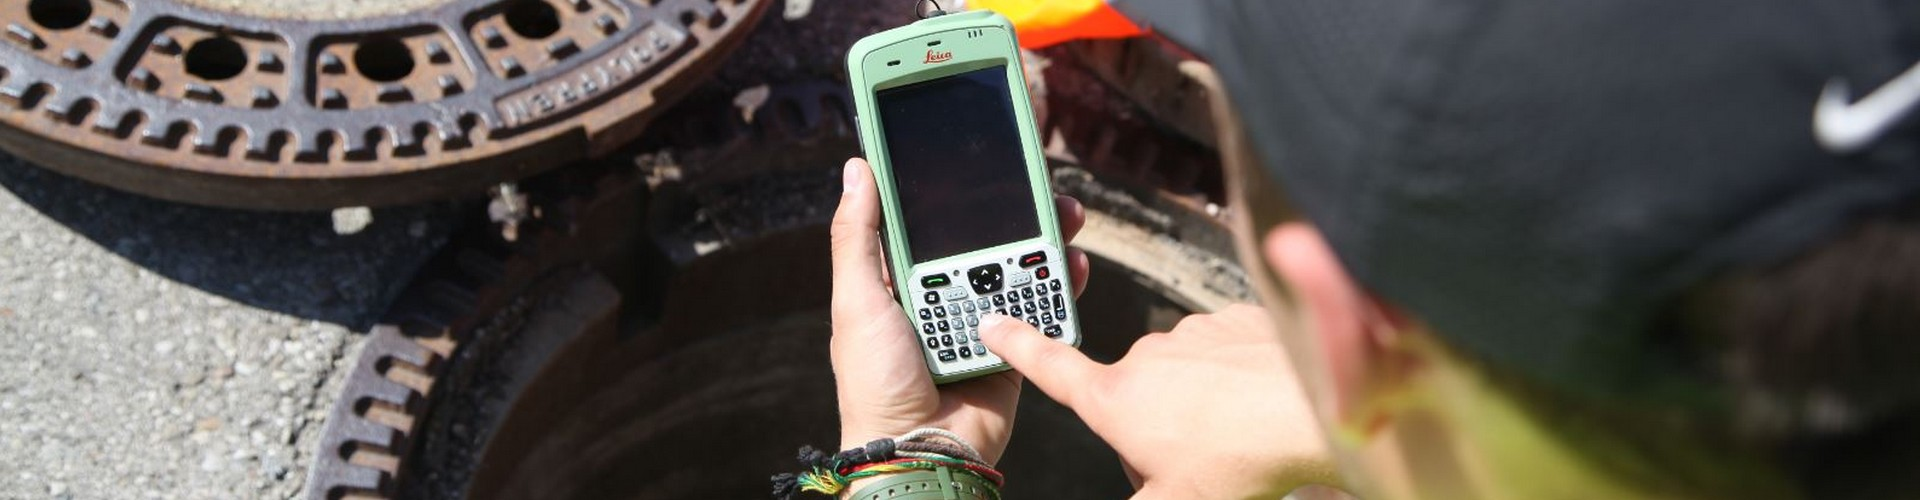 PDA Zeno 5